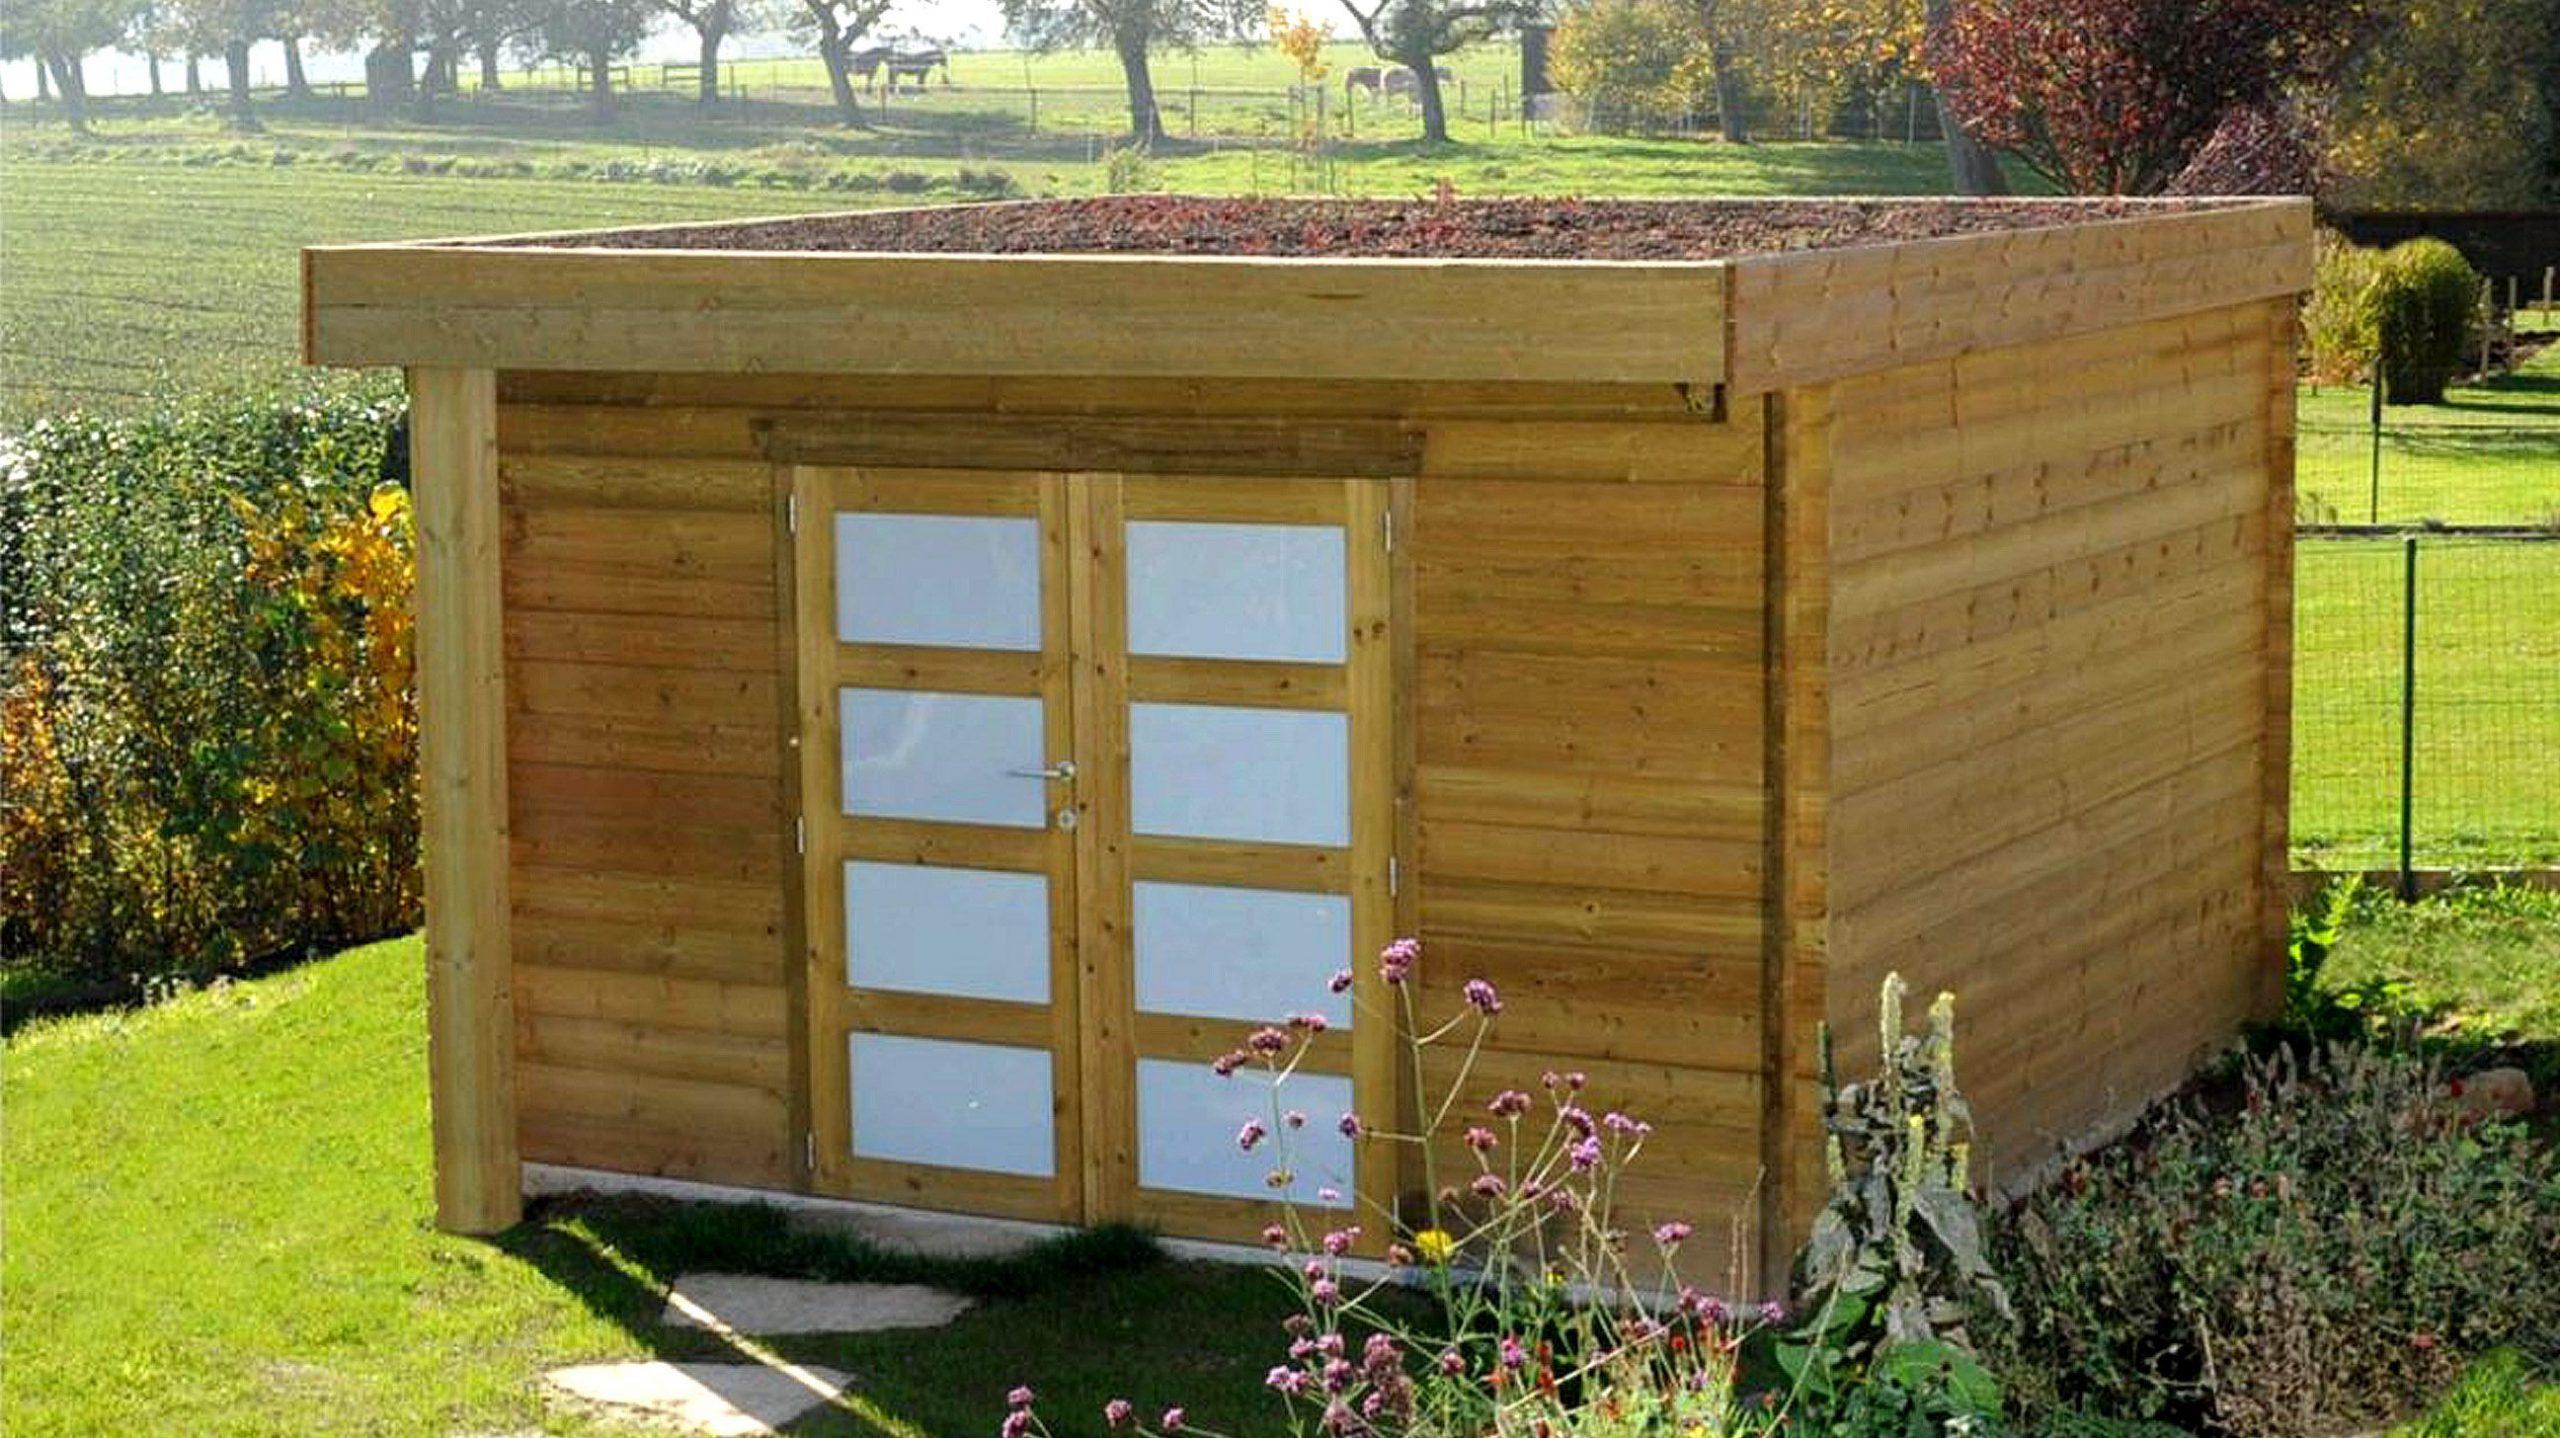 Abri De Jardin En Bois Traité - Abri De Jardin Sur Mesure ... serapportantà Abri De Jardin Sur Mesure